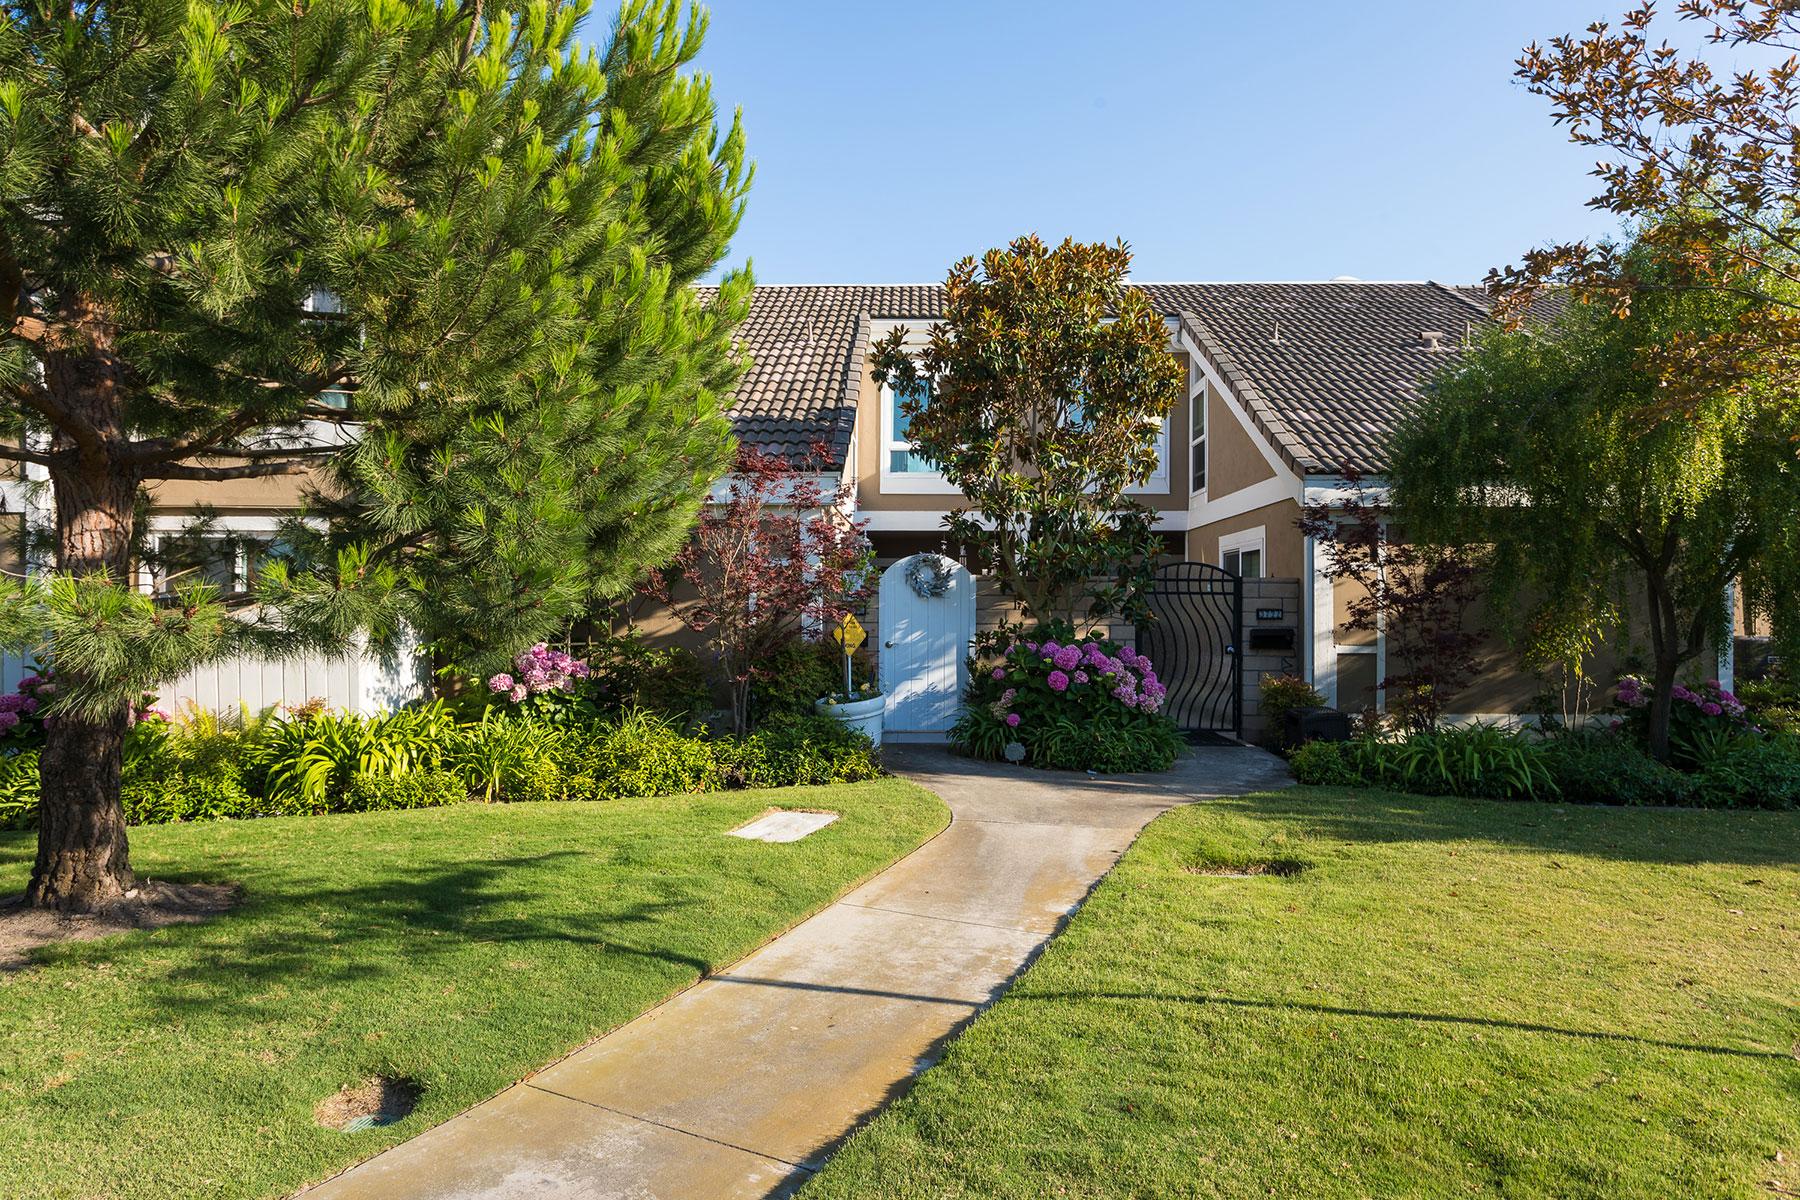 Single Family Home for Sale at 3726 Montego Huntington Beach, California, 92649 United States